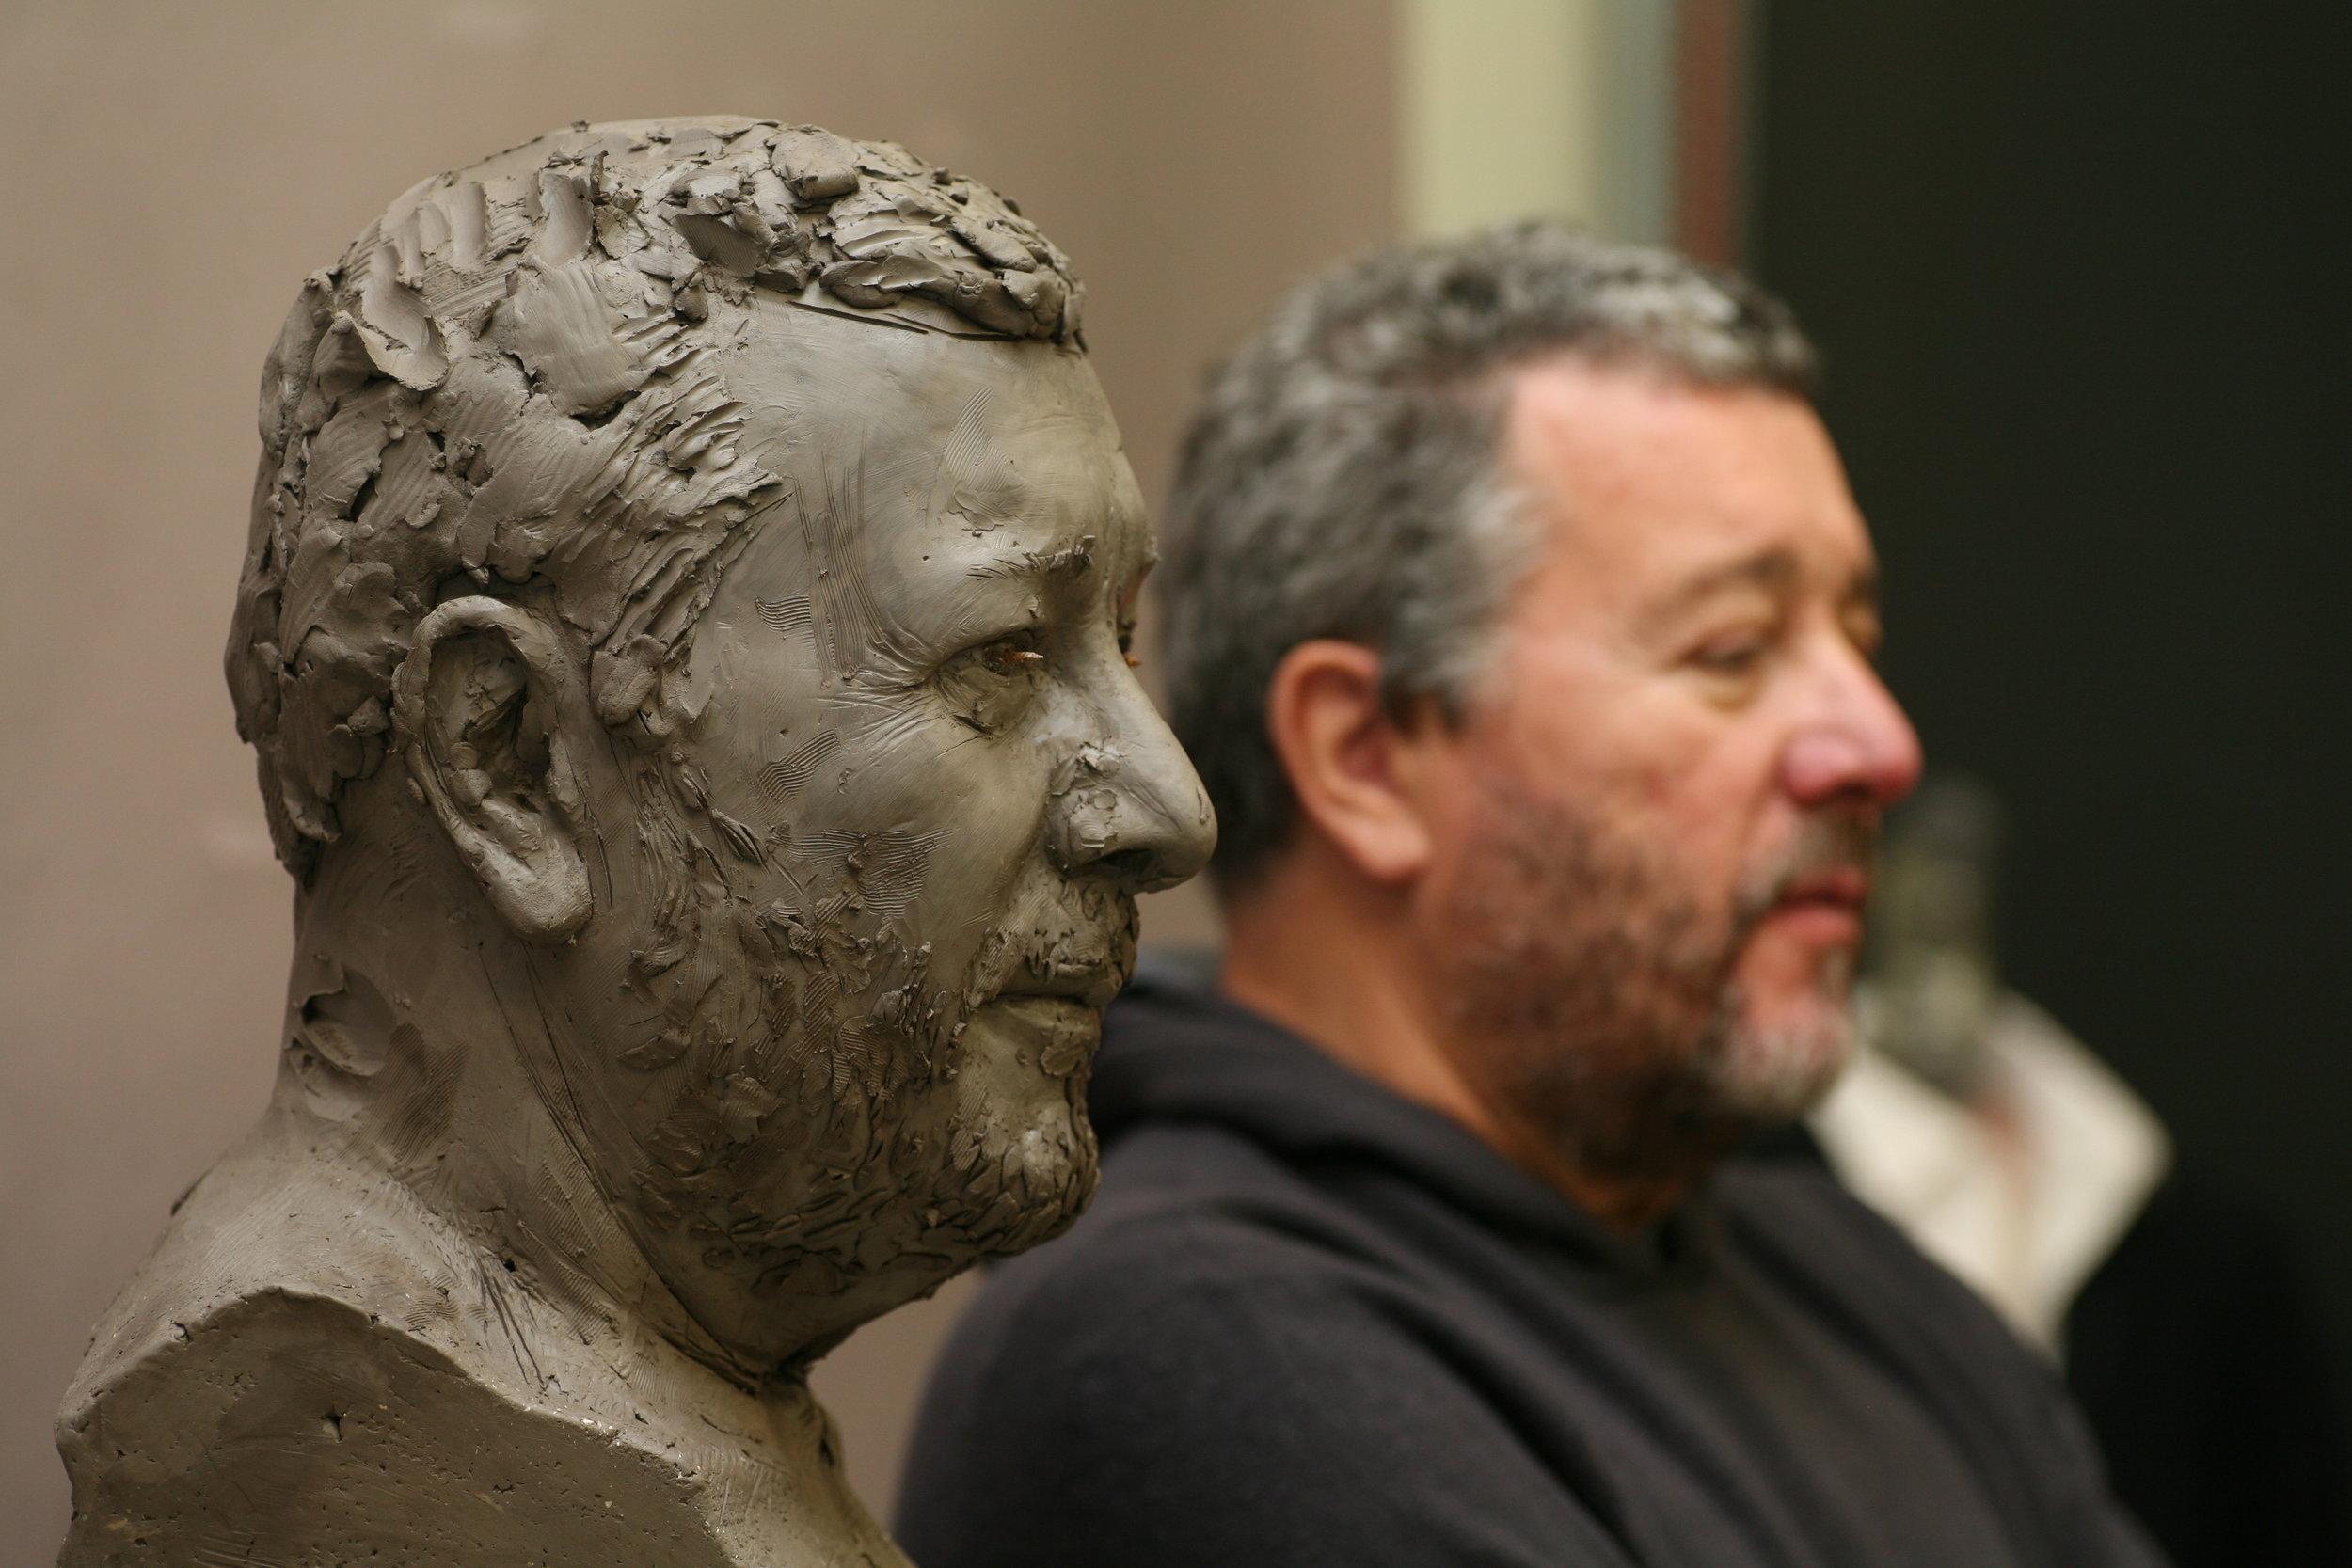 Philippe Starck et sa sculpture - Clay sculpture by Eric Saint Chaffray - Credit Musée Grévin